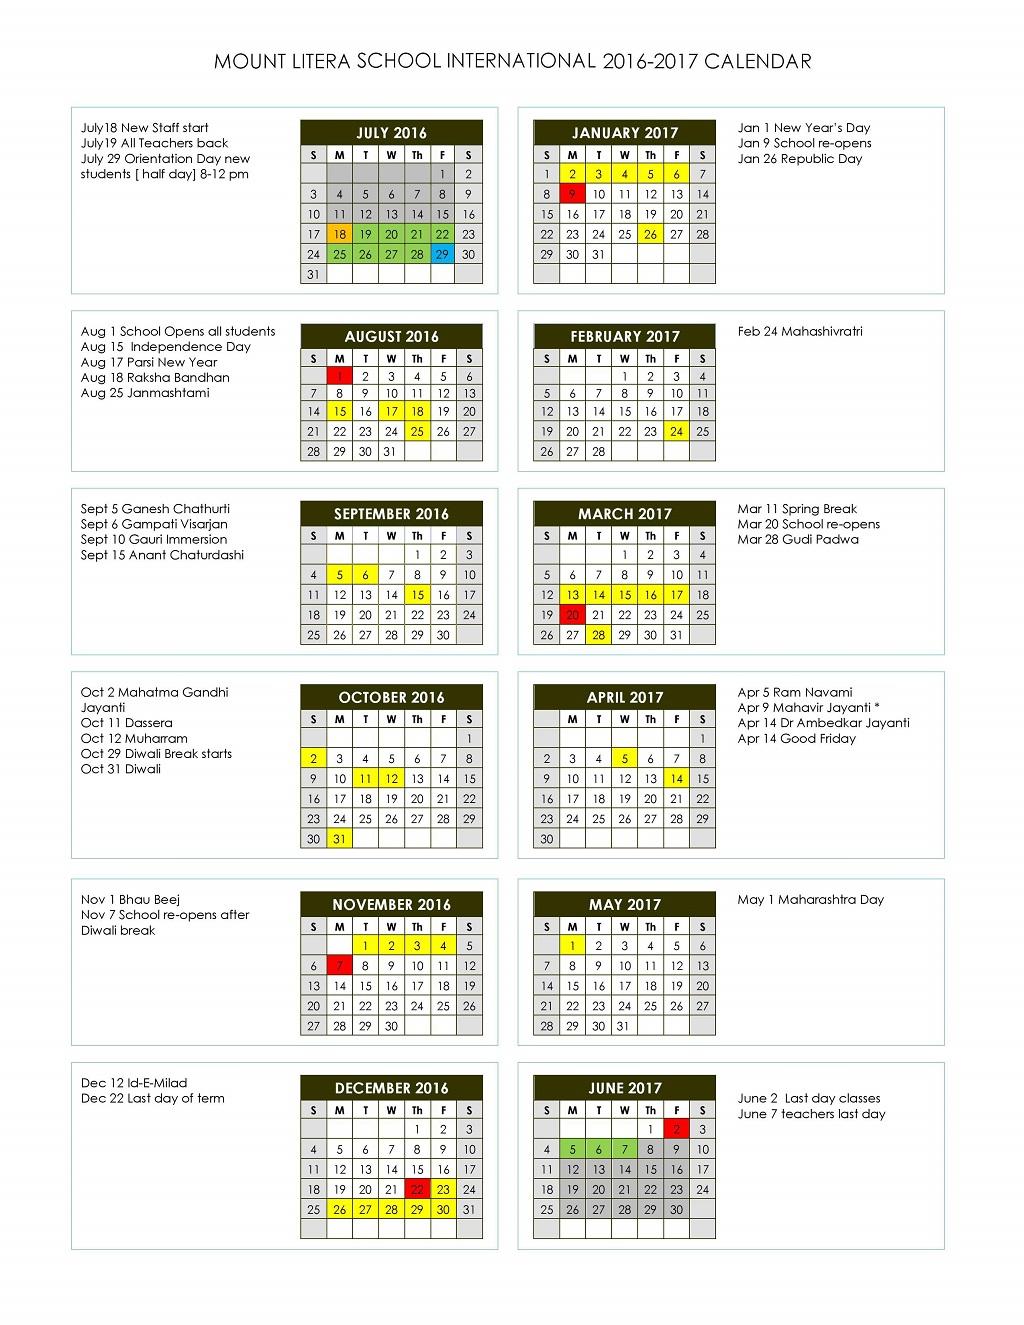 MLSI Final school year calendar final 2016-2017